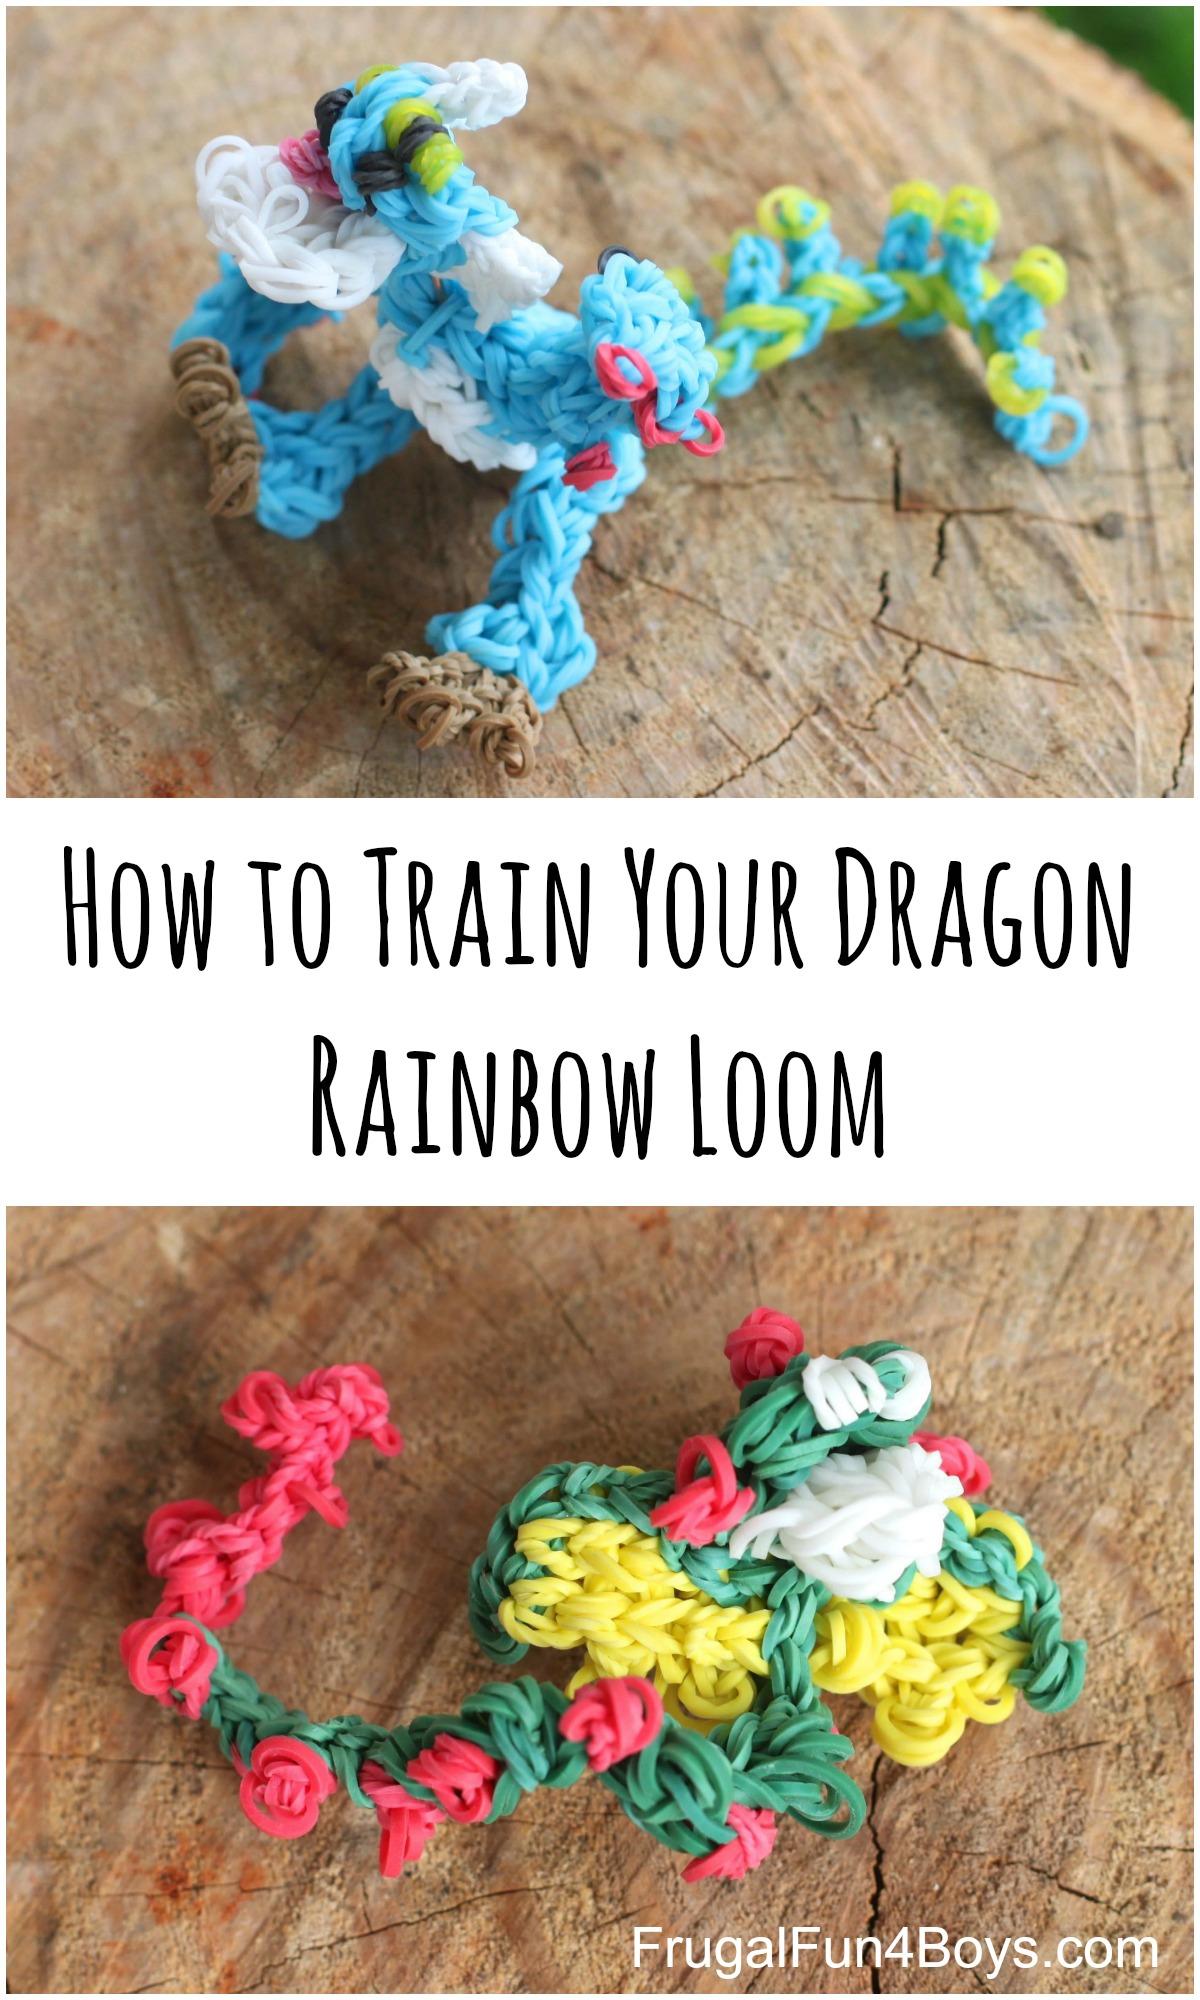 How to Train Your Dragon 2 Rainbow Loom